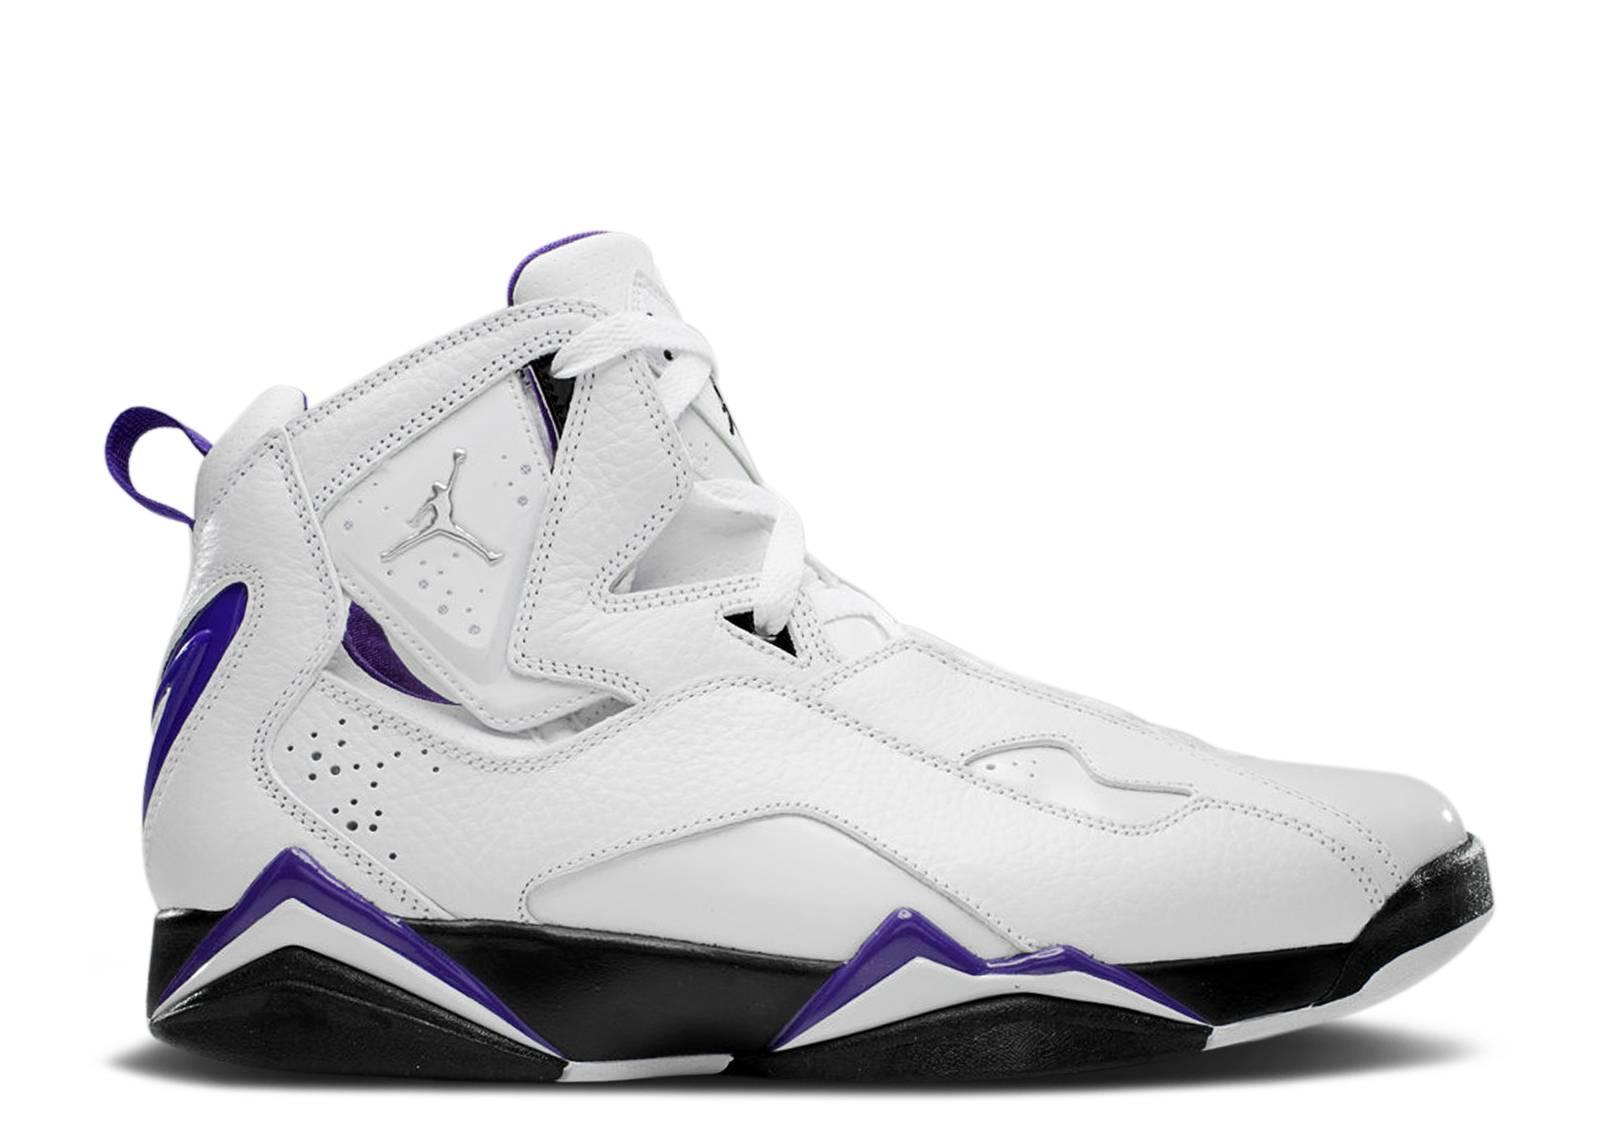 98756a06abf98a air jordan true flight white metallic silver black varsity purple 342964 101